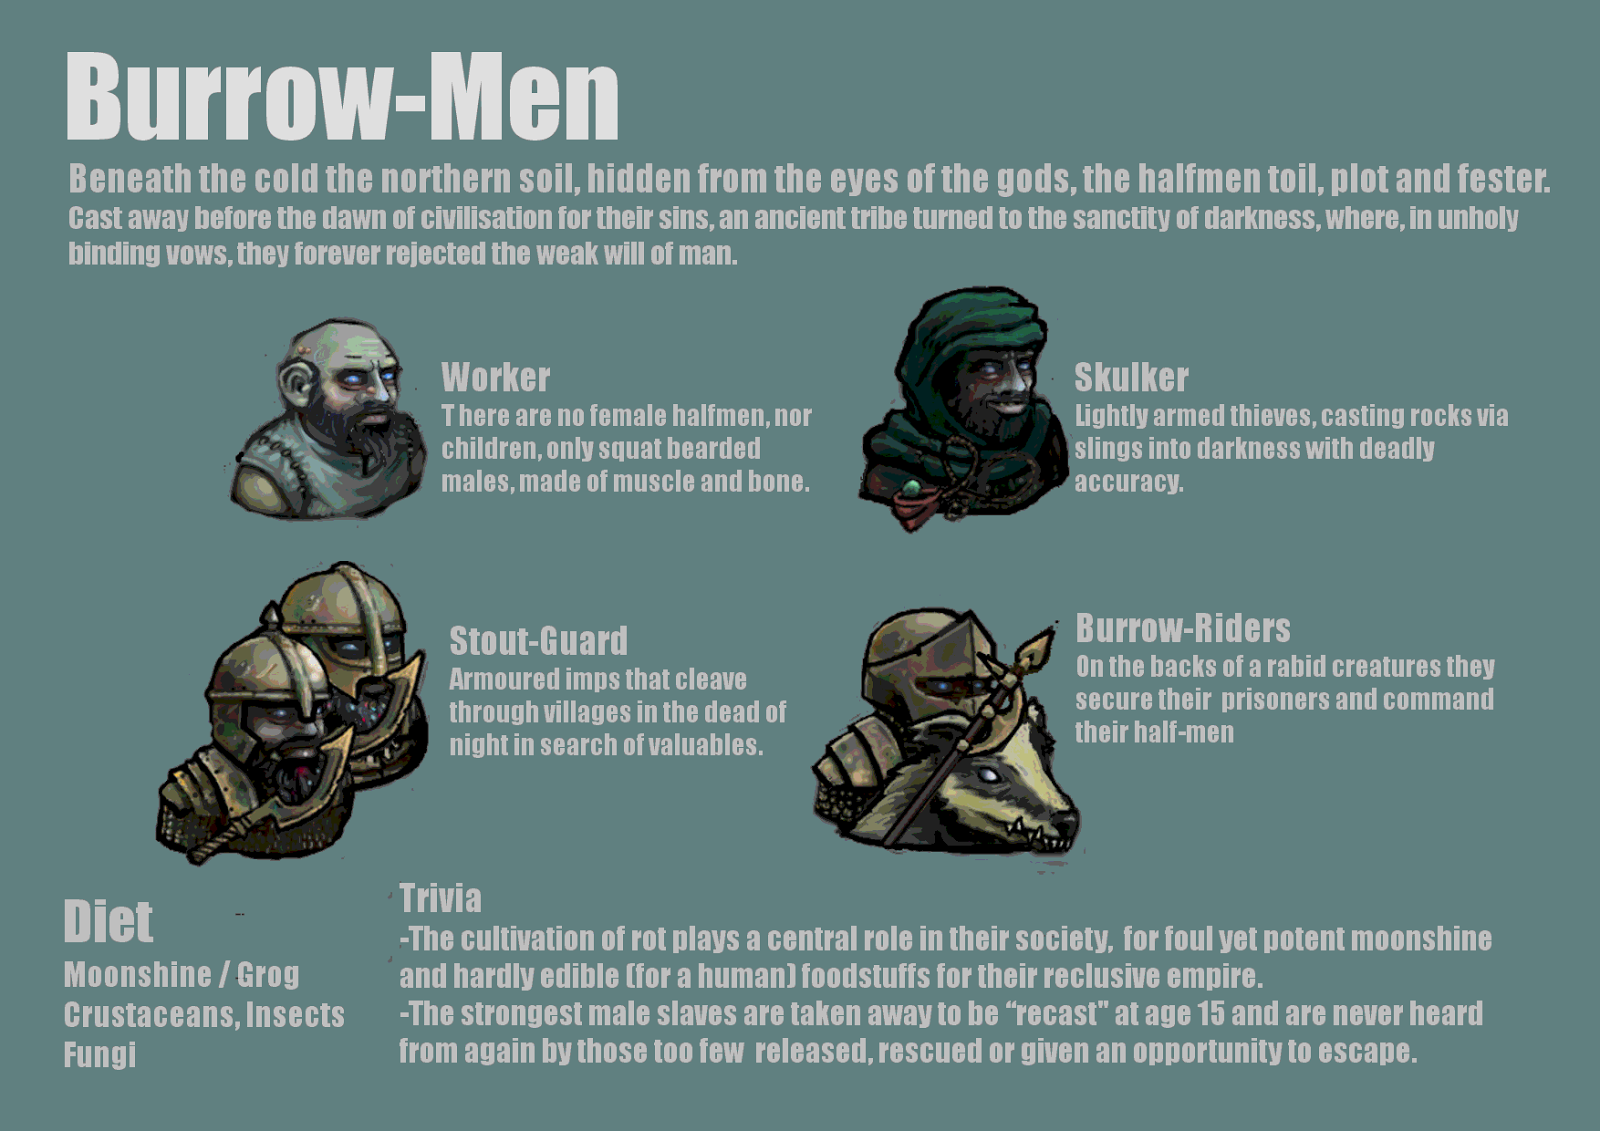 Burrow-Men